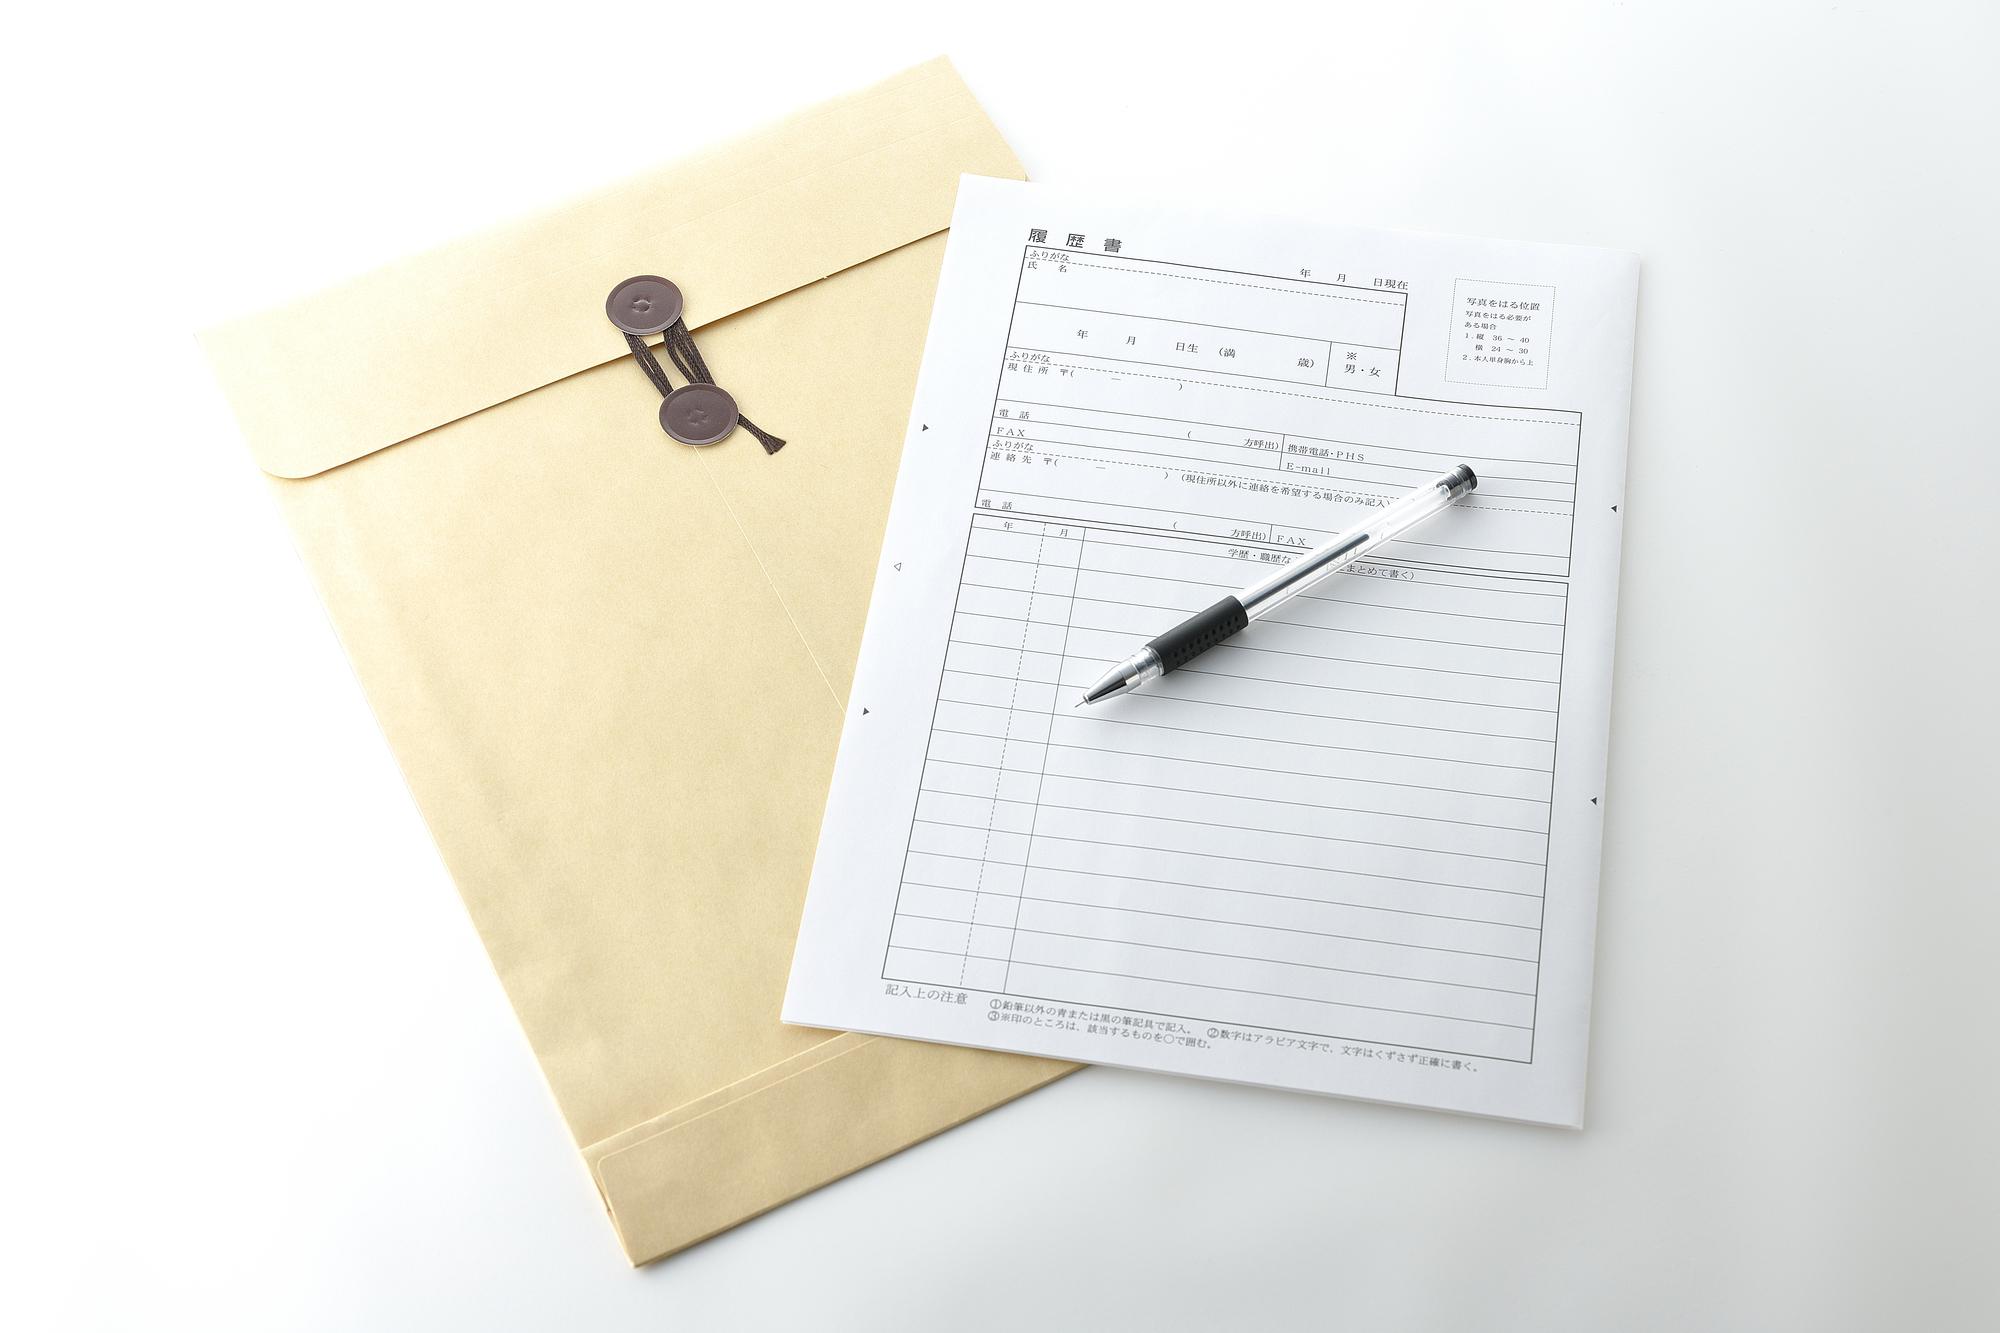 BtoB企業の内定を勝ち取るための志望動機の書き方